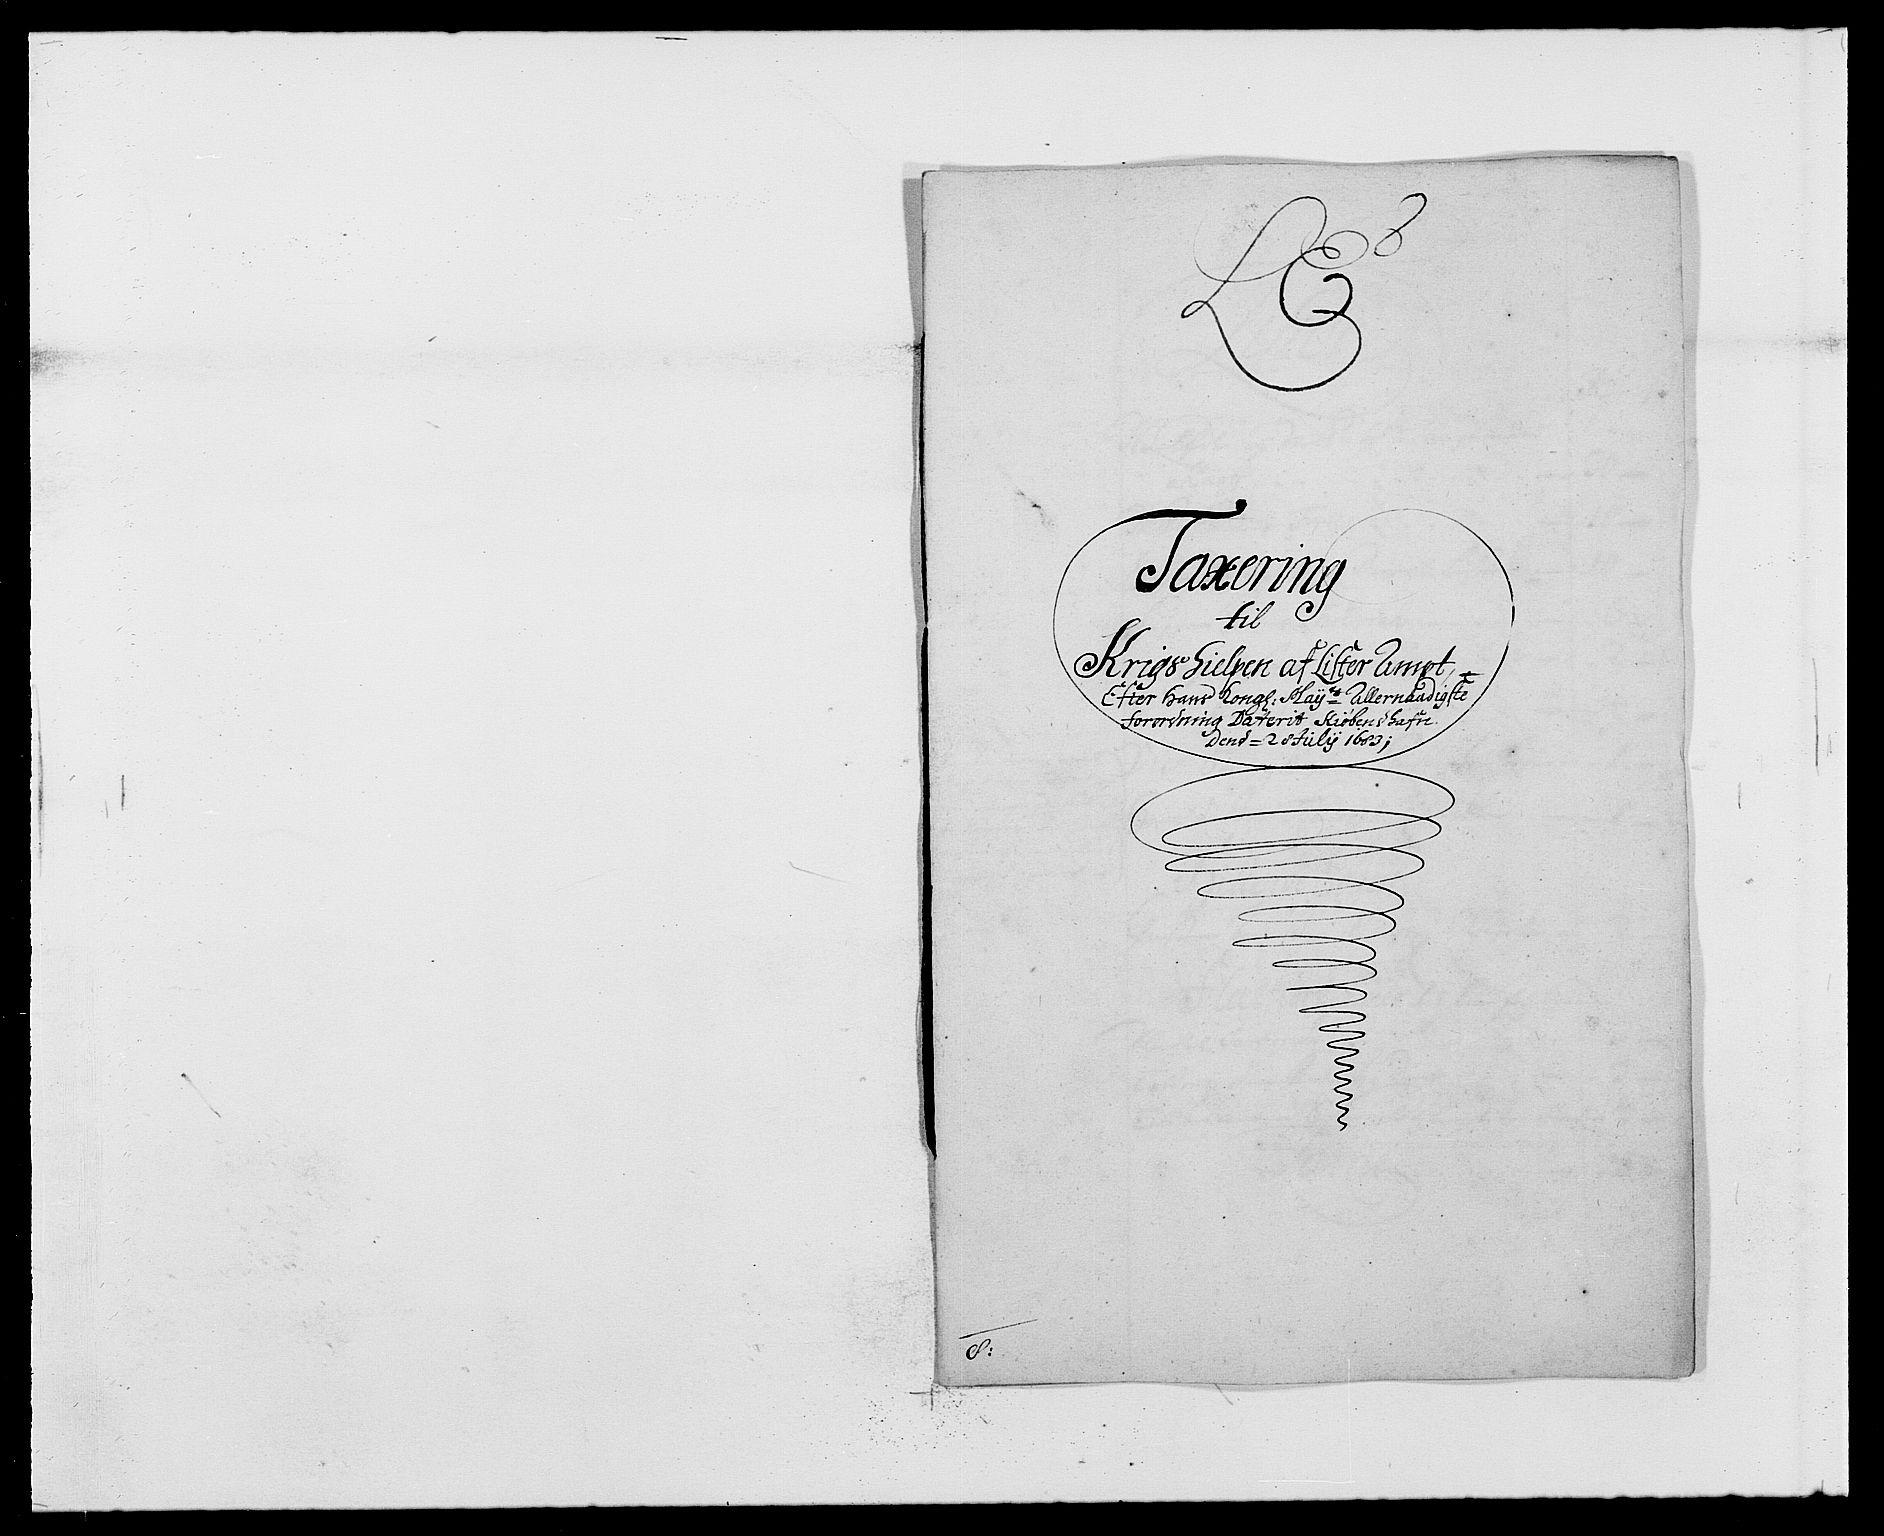 RA, Rentekammeret inntil 1814, Reviderte regnskaper, Fogderegnskap, R41/L2532: Fogderegnskap Lista, 1683, s. 126